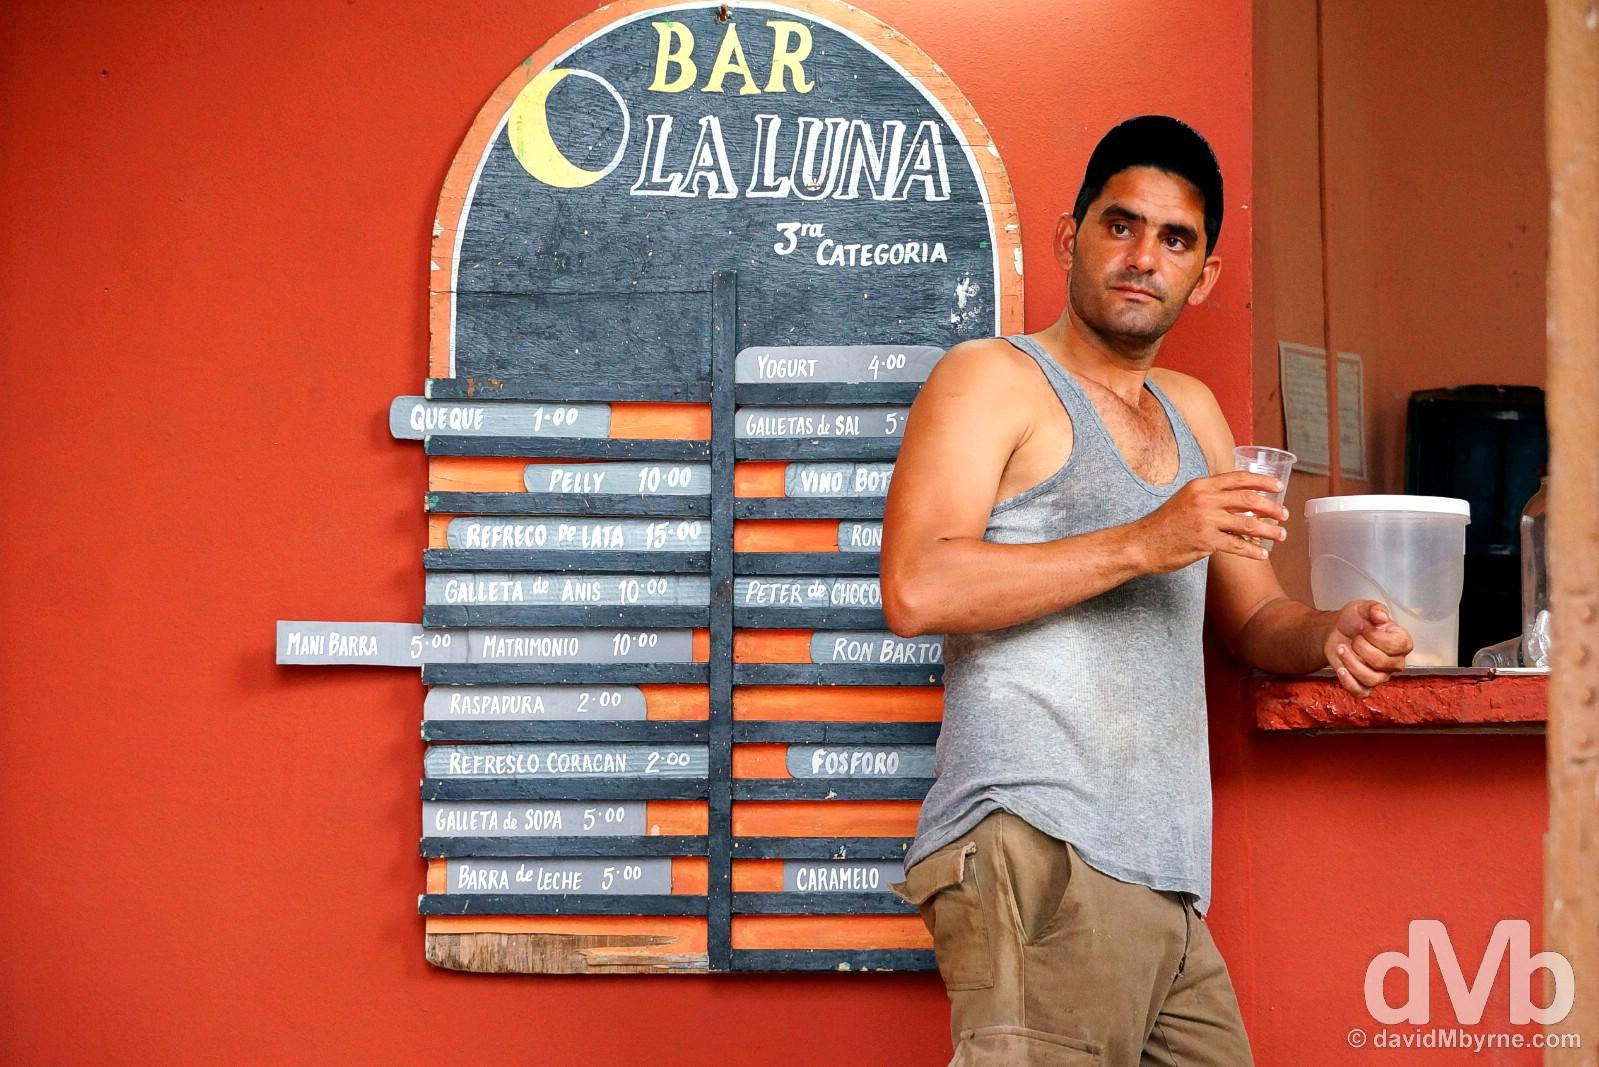 Bar La Luna, Trinidad, Cuba. May 5, 2015.